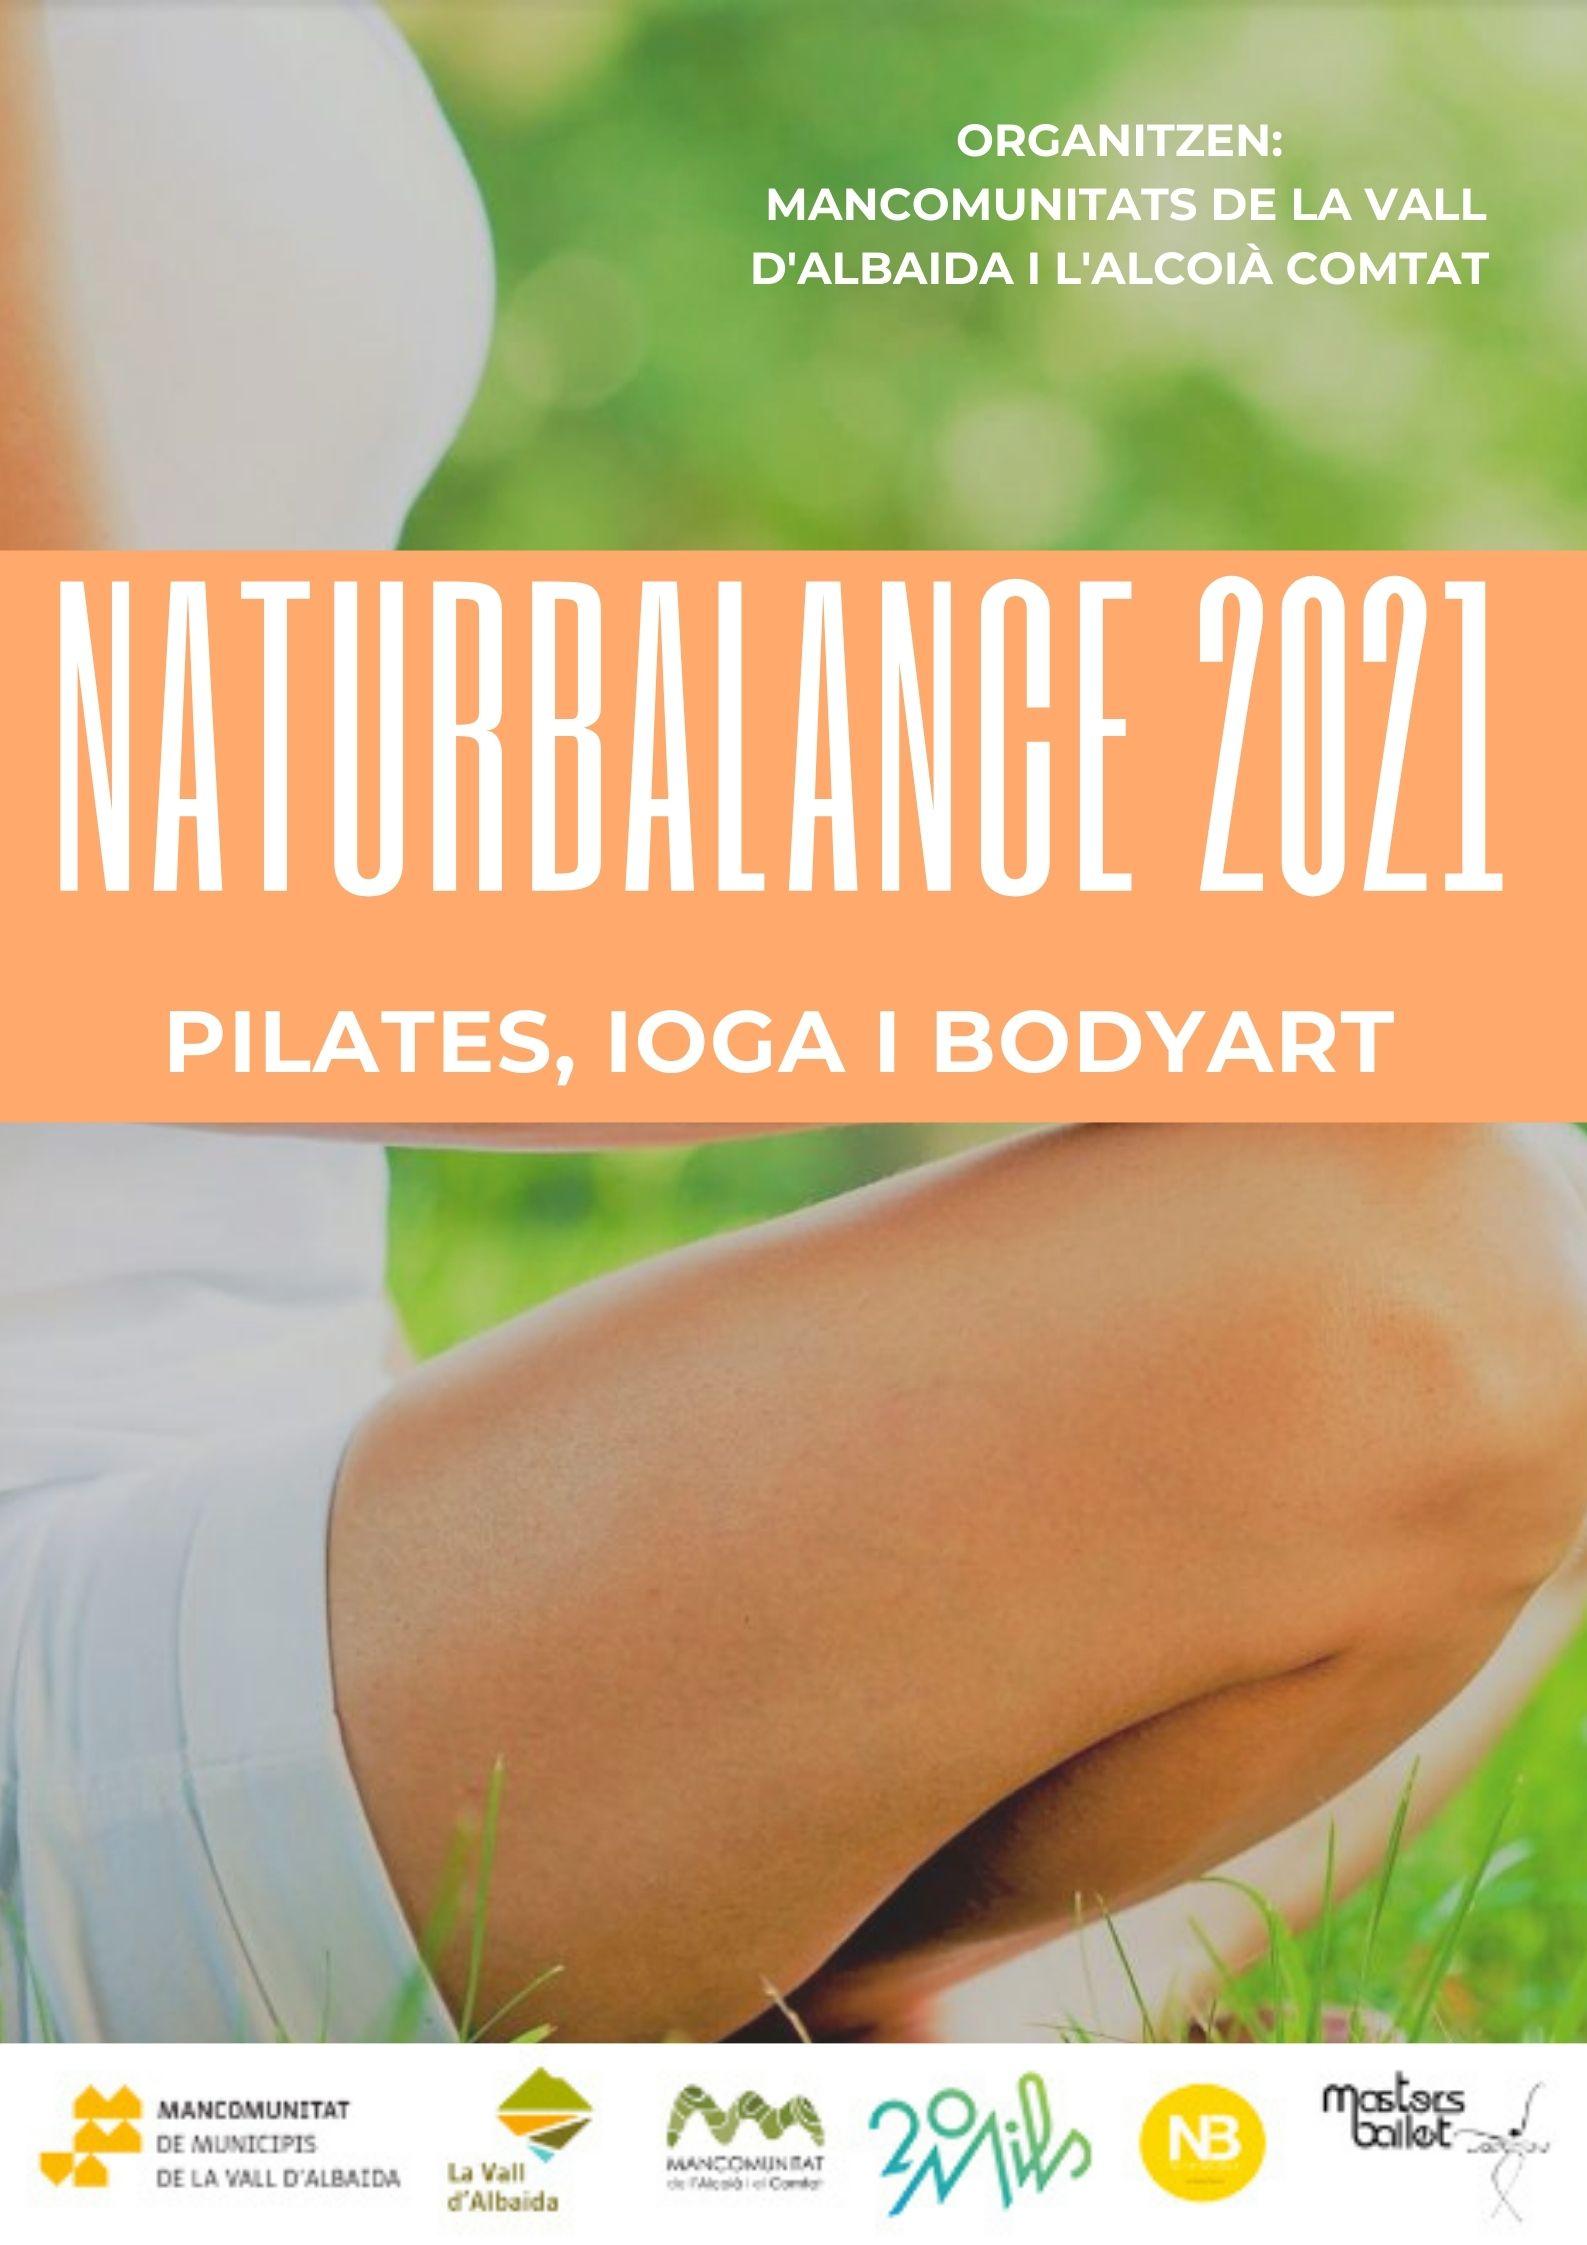 naturbalance 2021